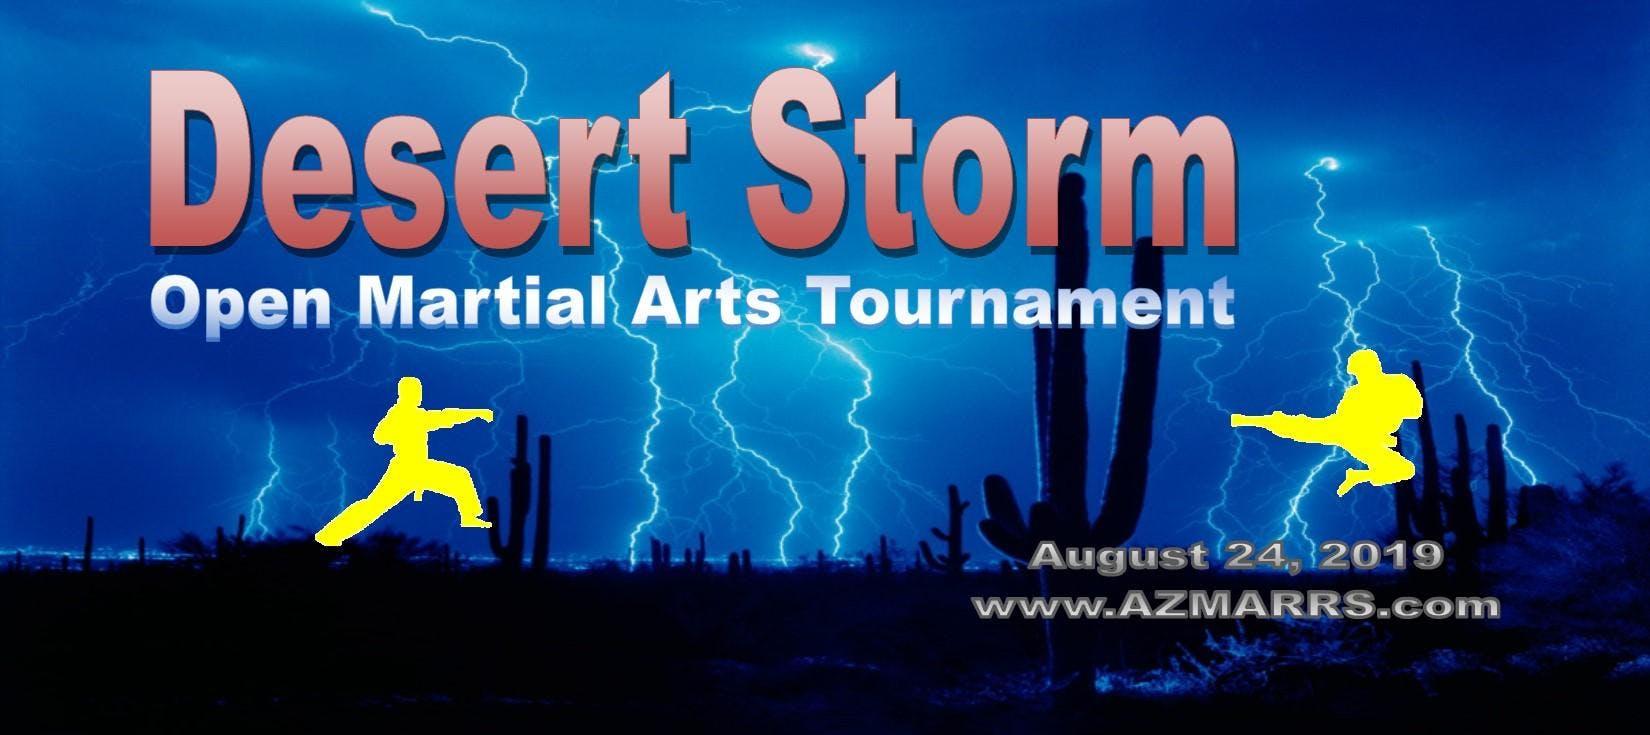 2019 Desert Storm Open Martial Arts Tournament